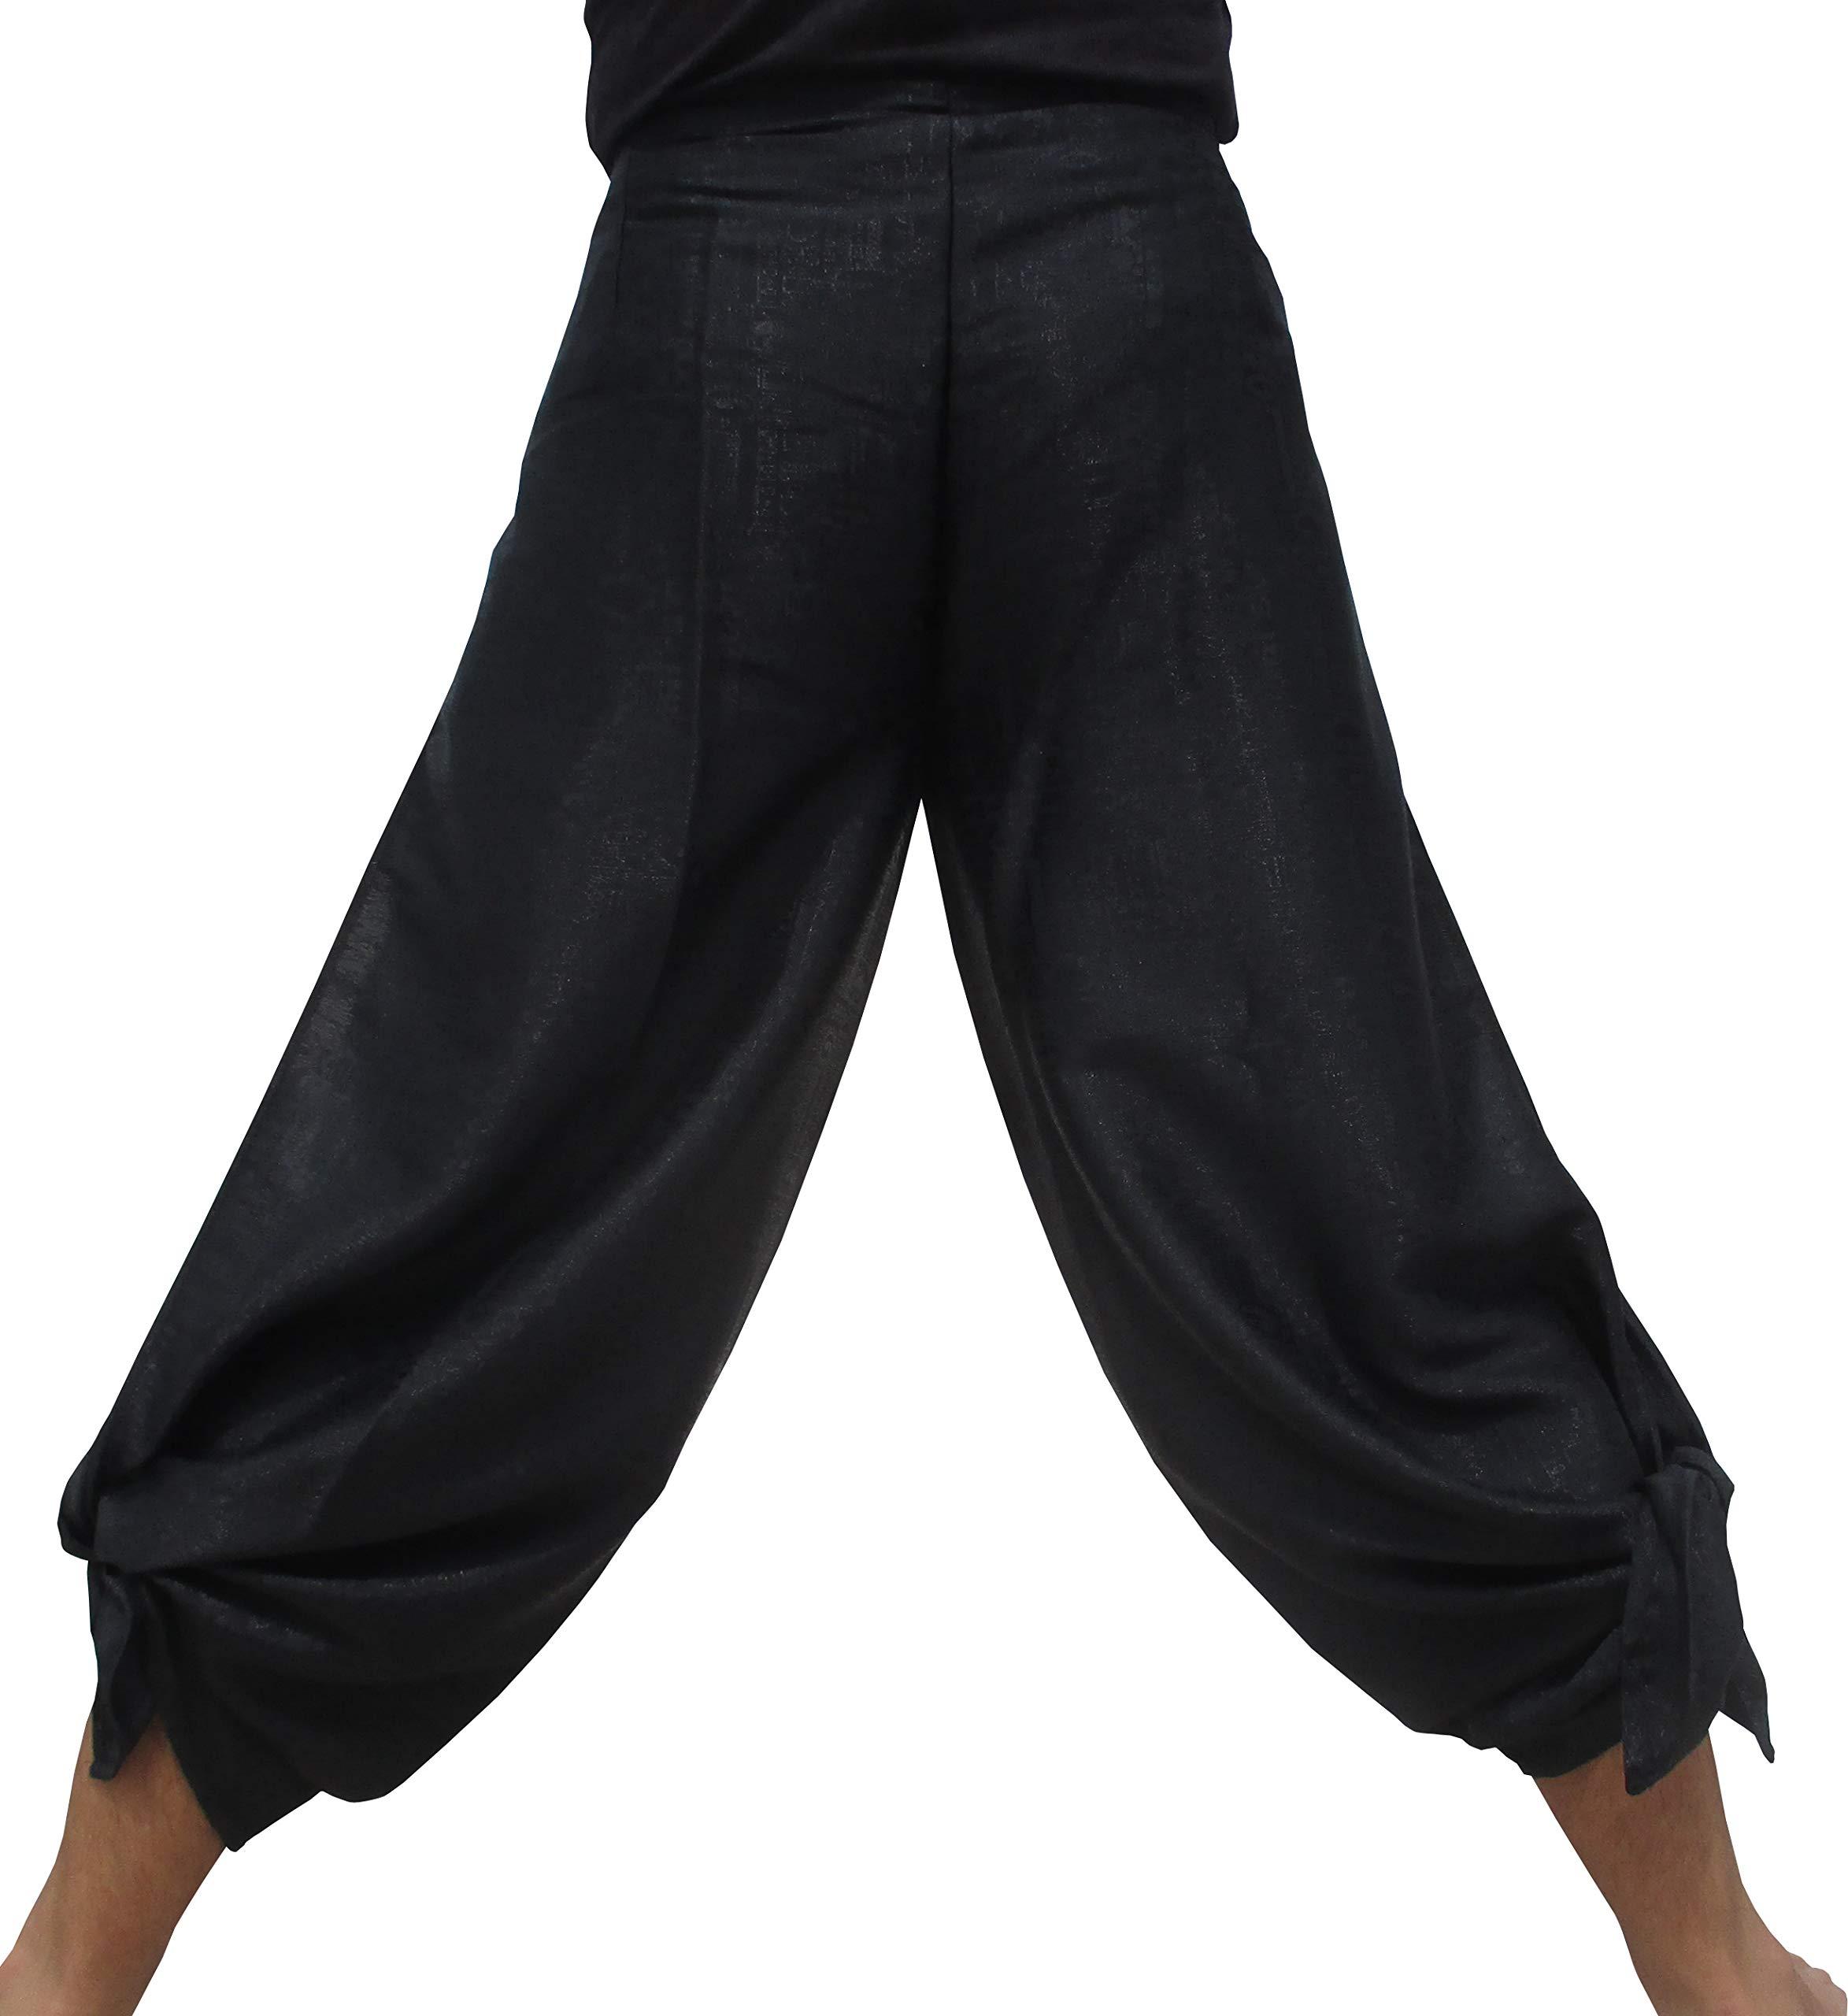 RaanPahMuang Brand Geometric Thick Textured Silk Drive in Wrap Pants, XX-Large, Black by RaanPahMuang